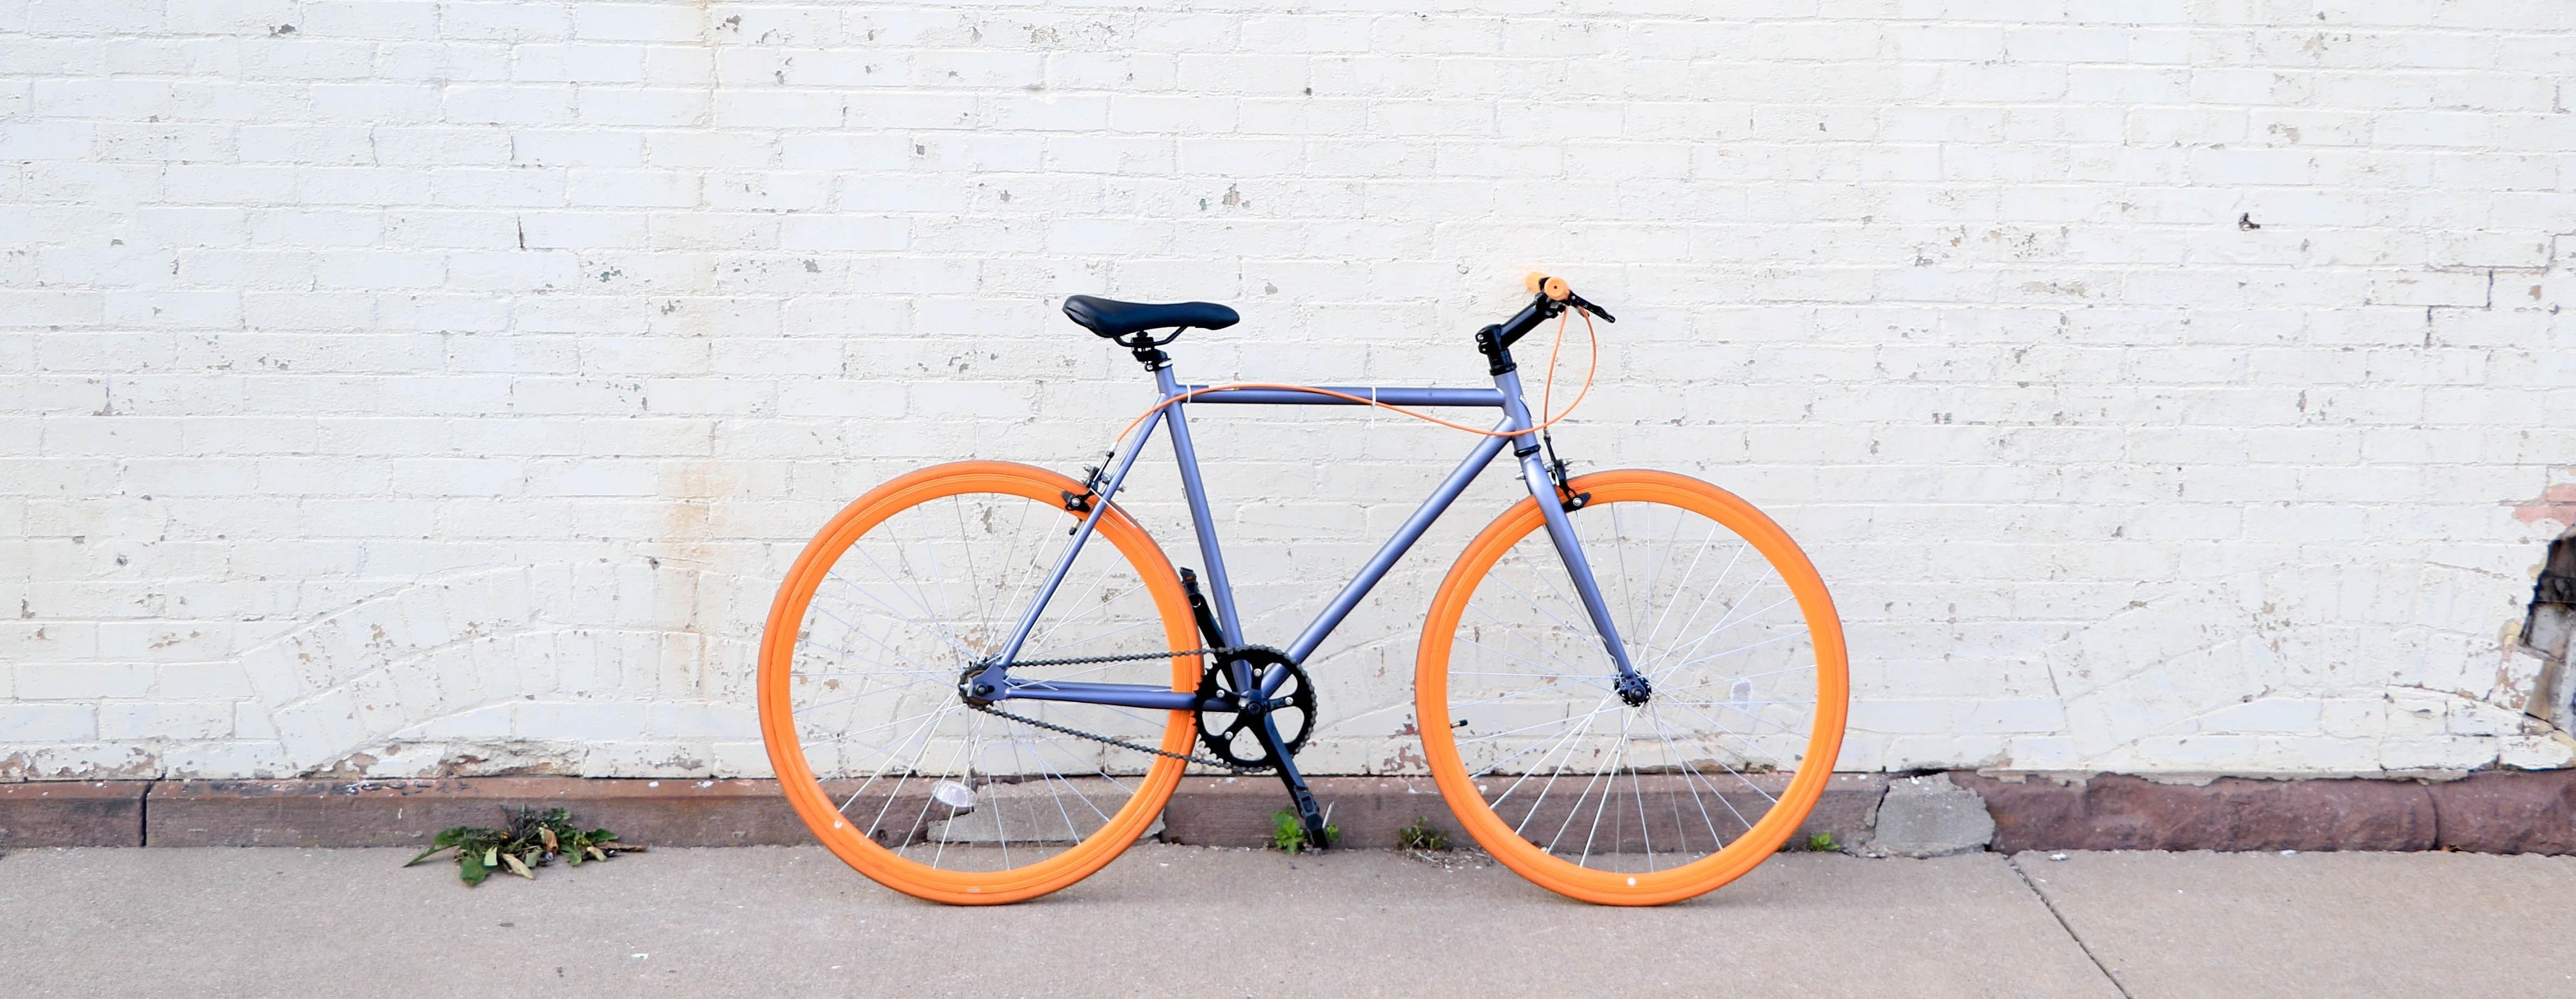 vendre entreprise velo reparation cycles